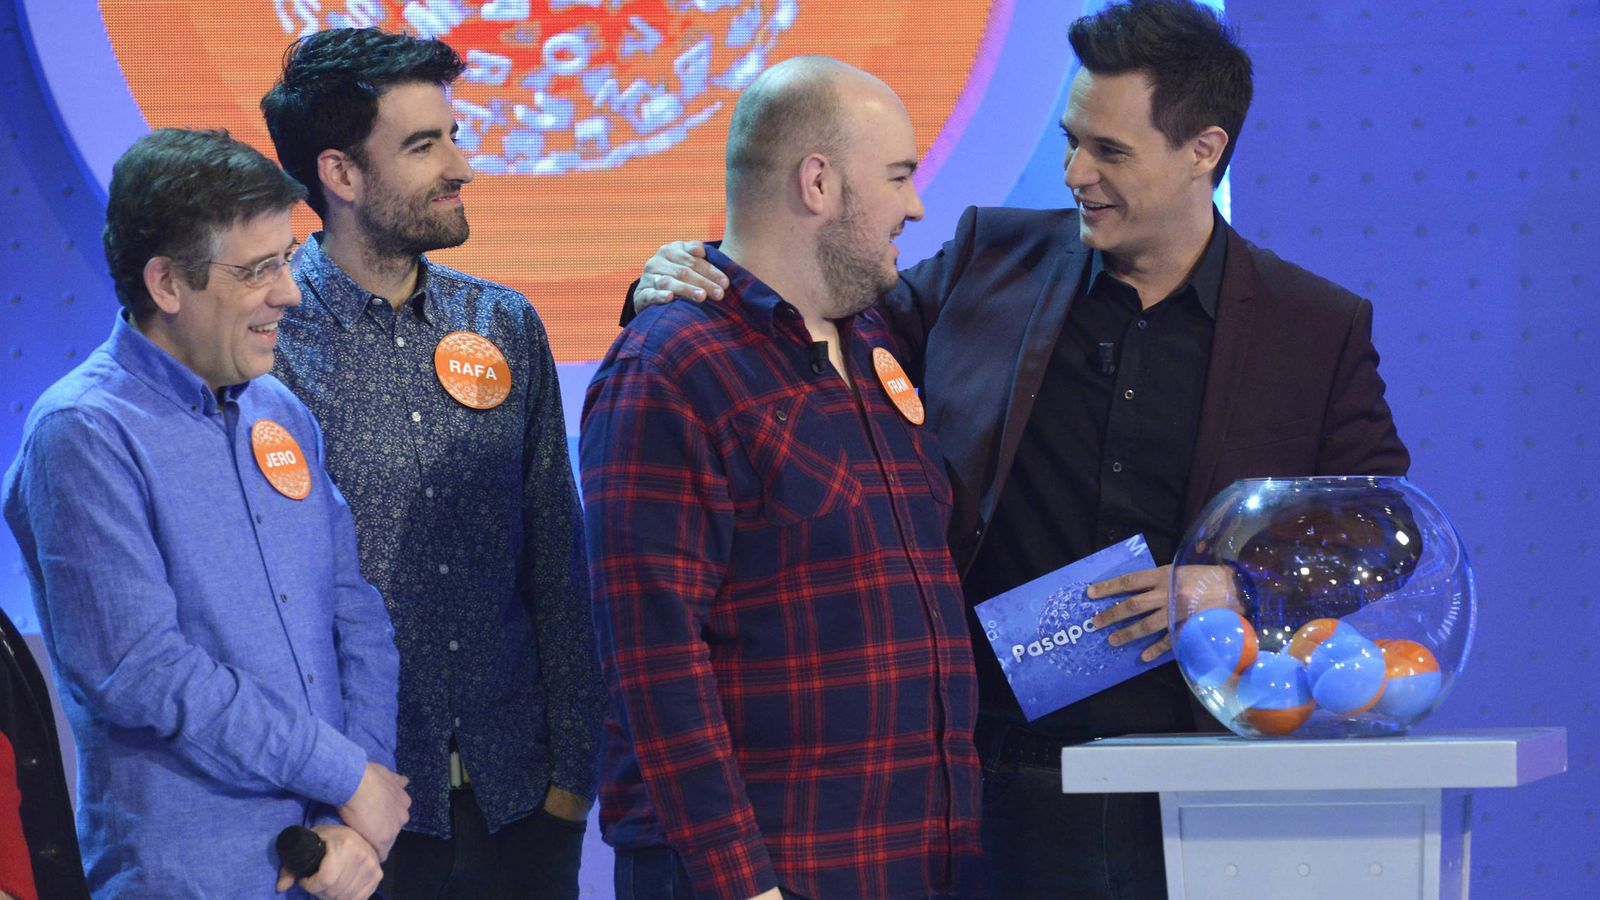 Foto: Fran González, junto a otros concursantes históricos de 'Pasapalabra'. (Mediaset)